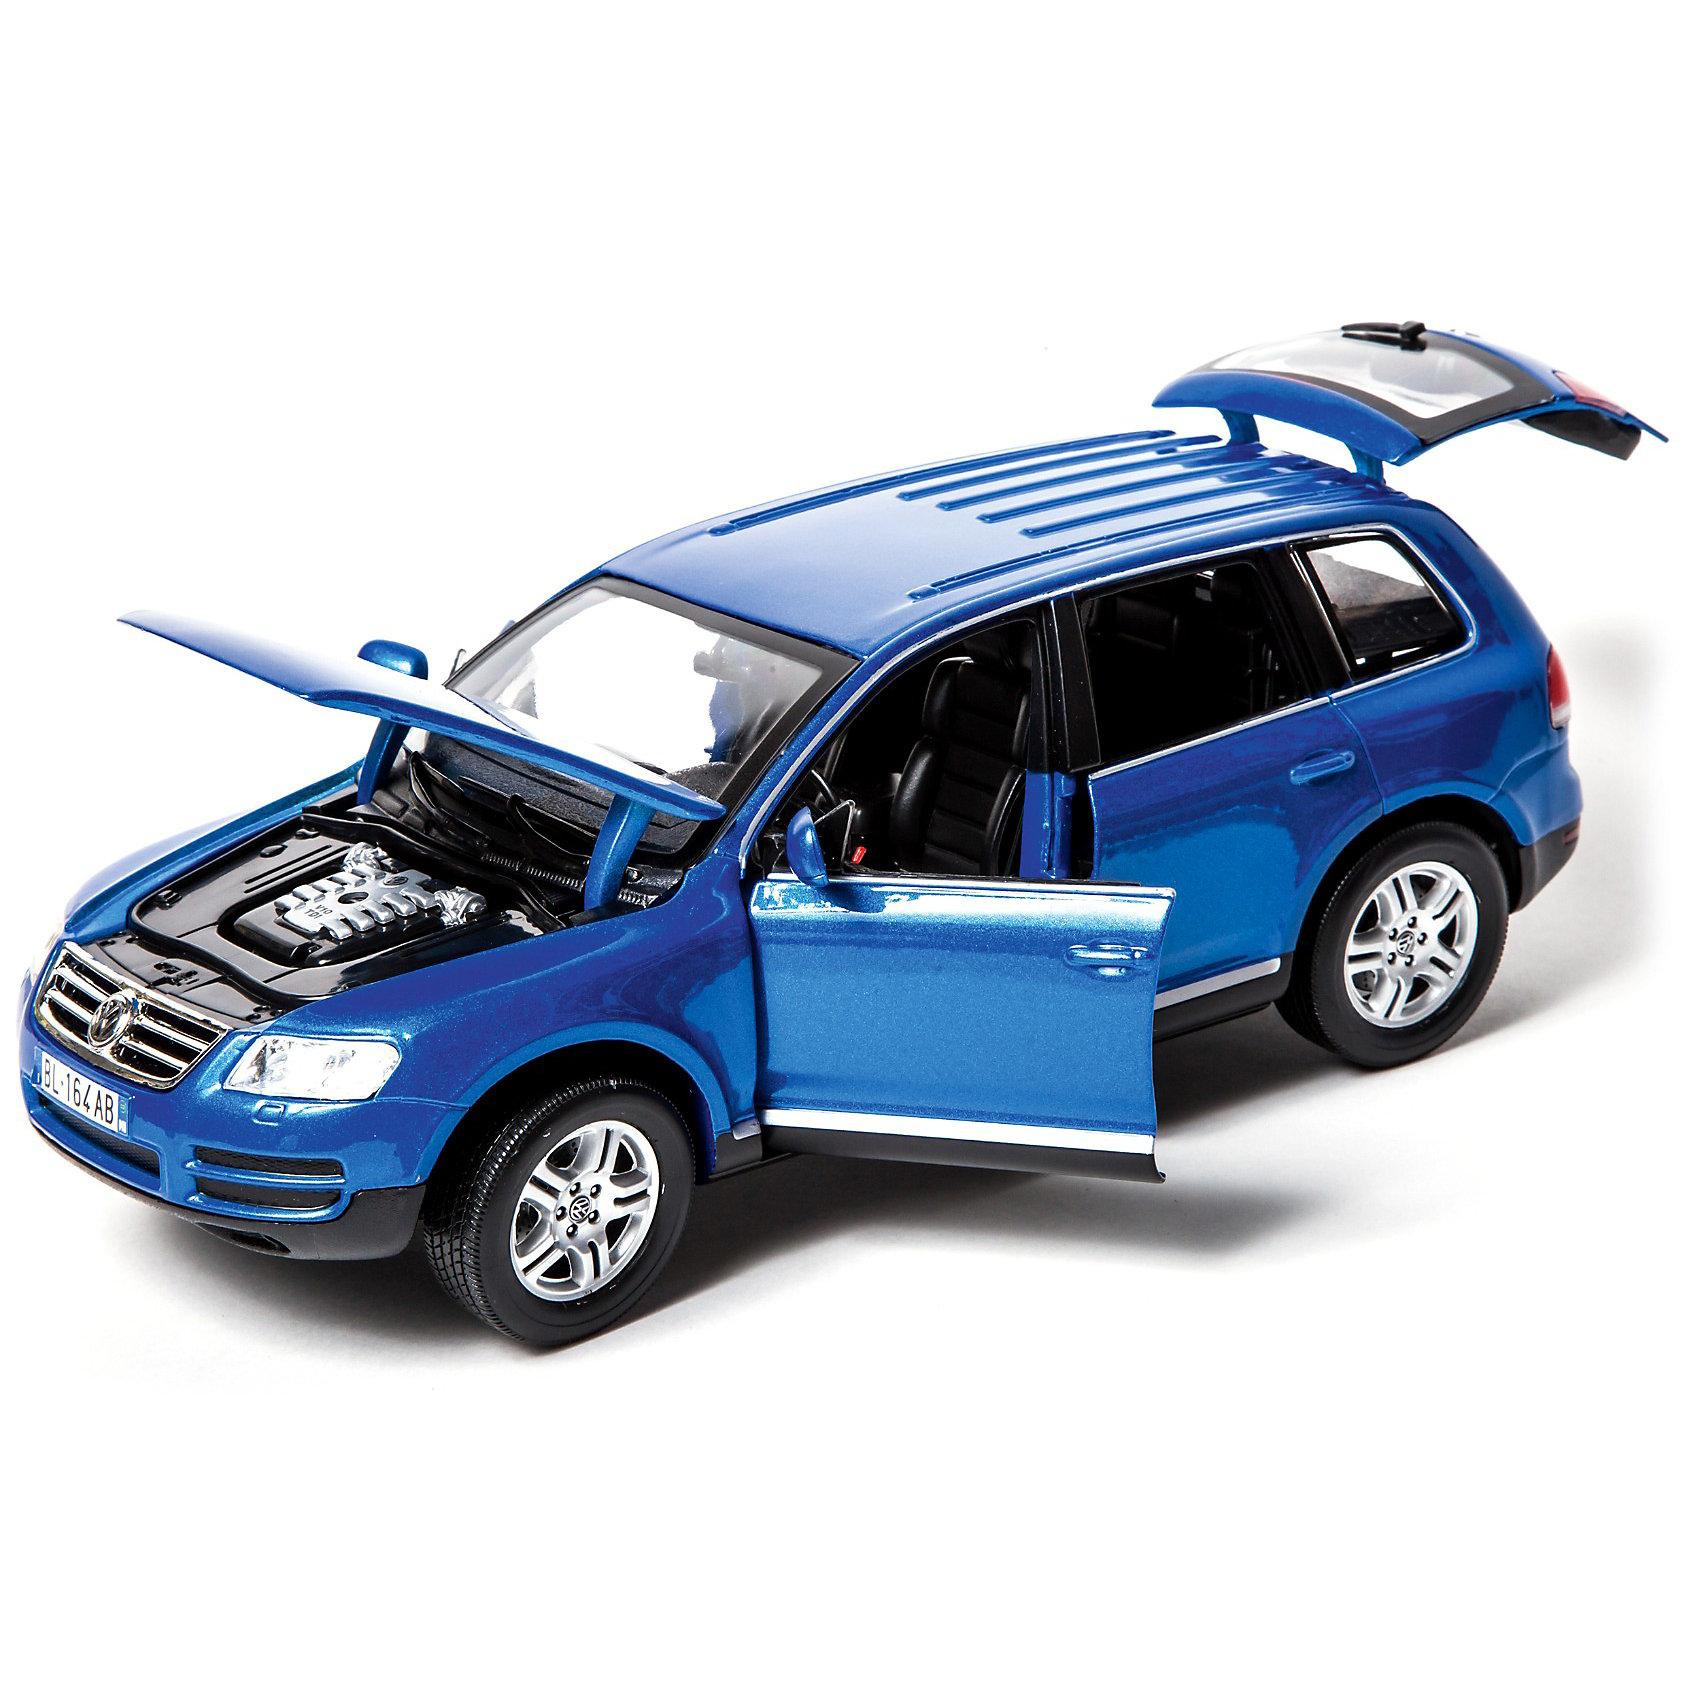 Bburago Машина Volkswagen Touareg металл., 1:18, Bburago автомобиль bburago lamborghini sesto elemento 1 24 18 21061